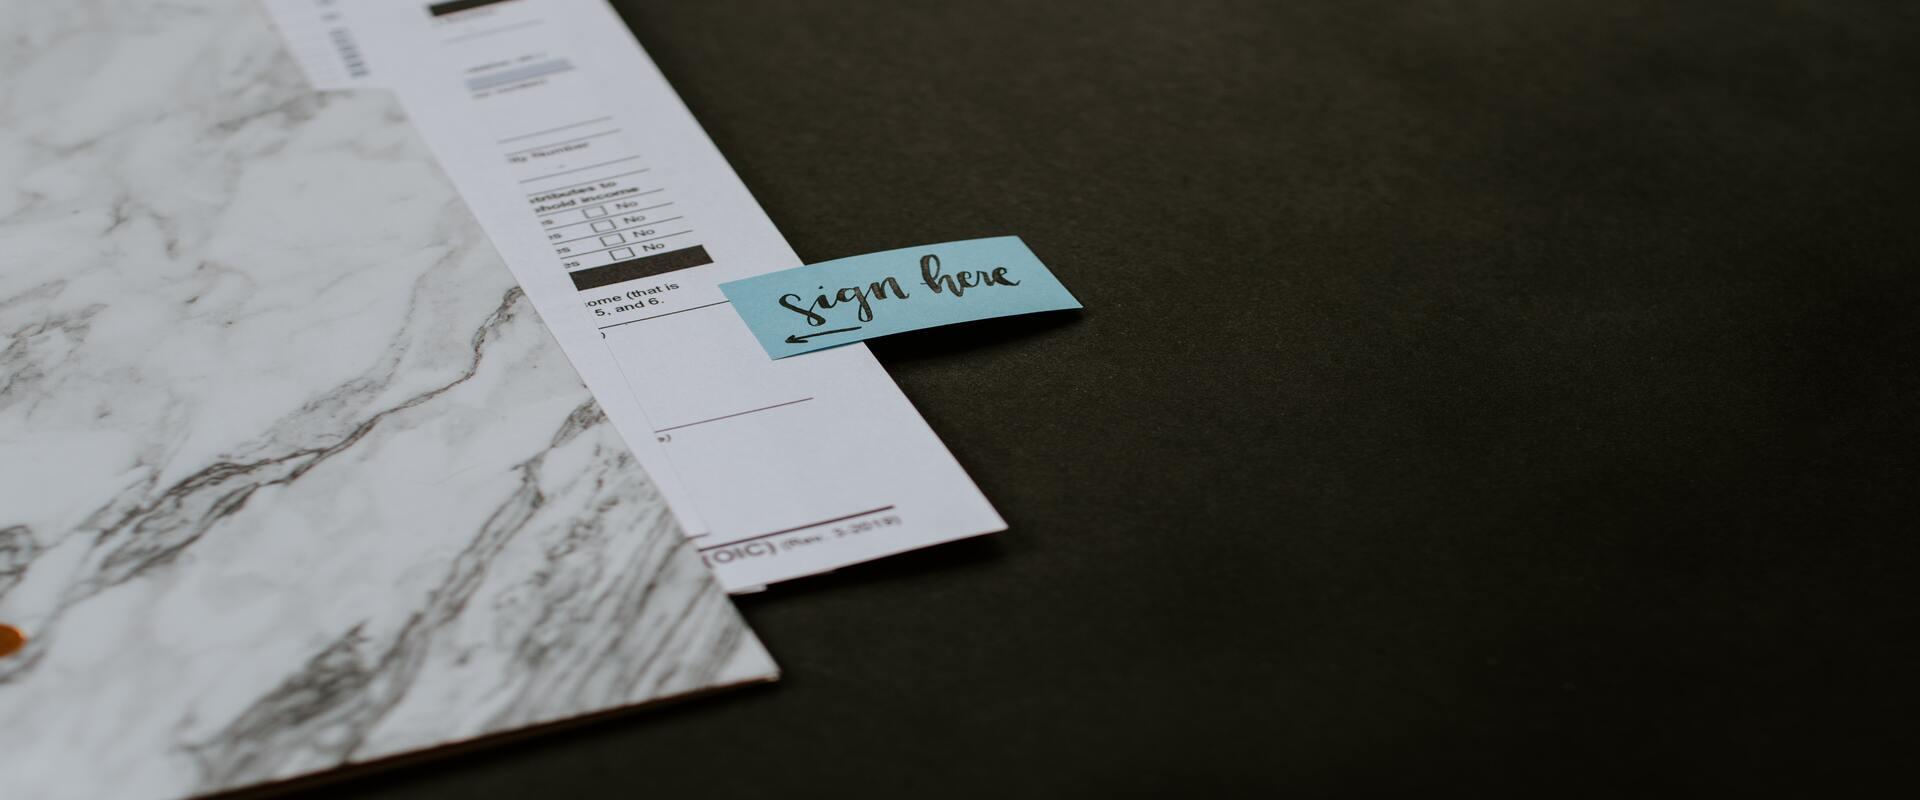 How to create a digital signature